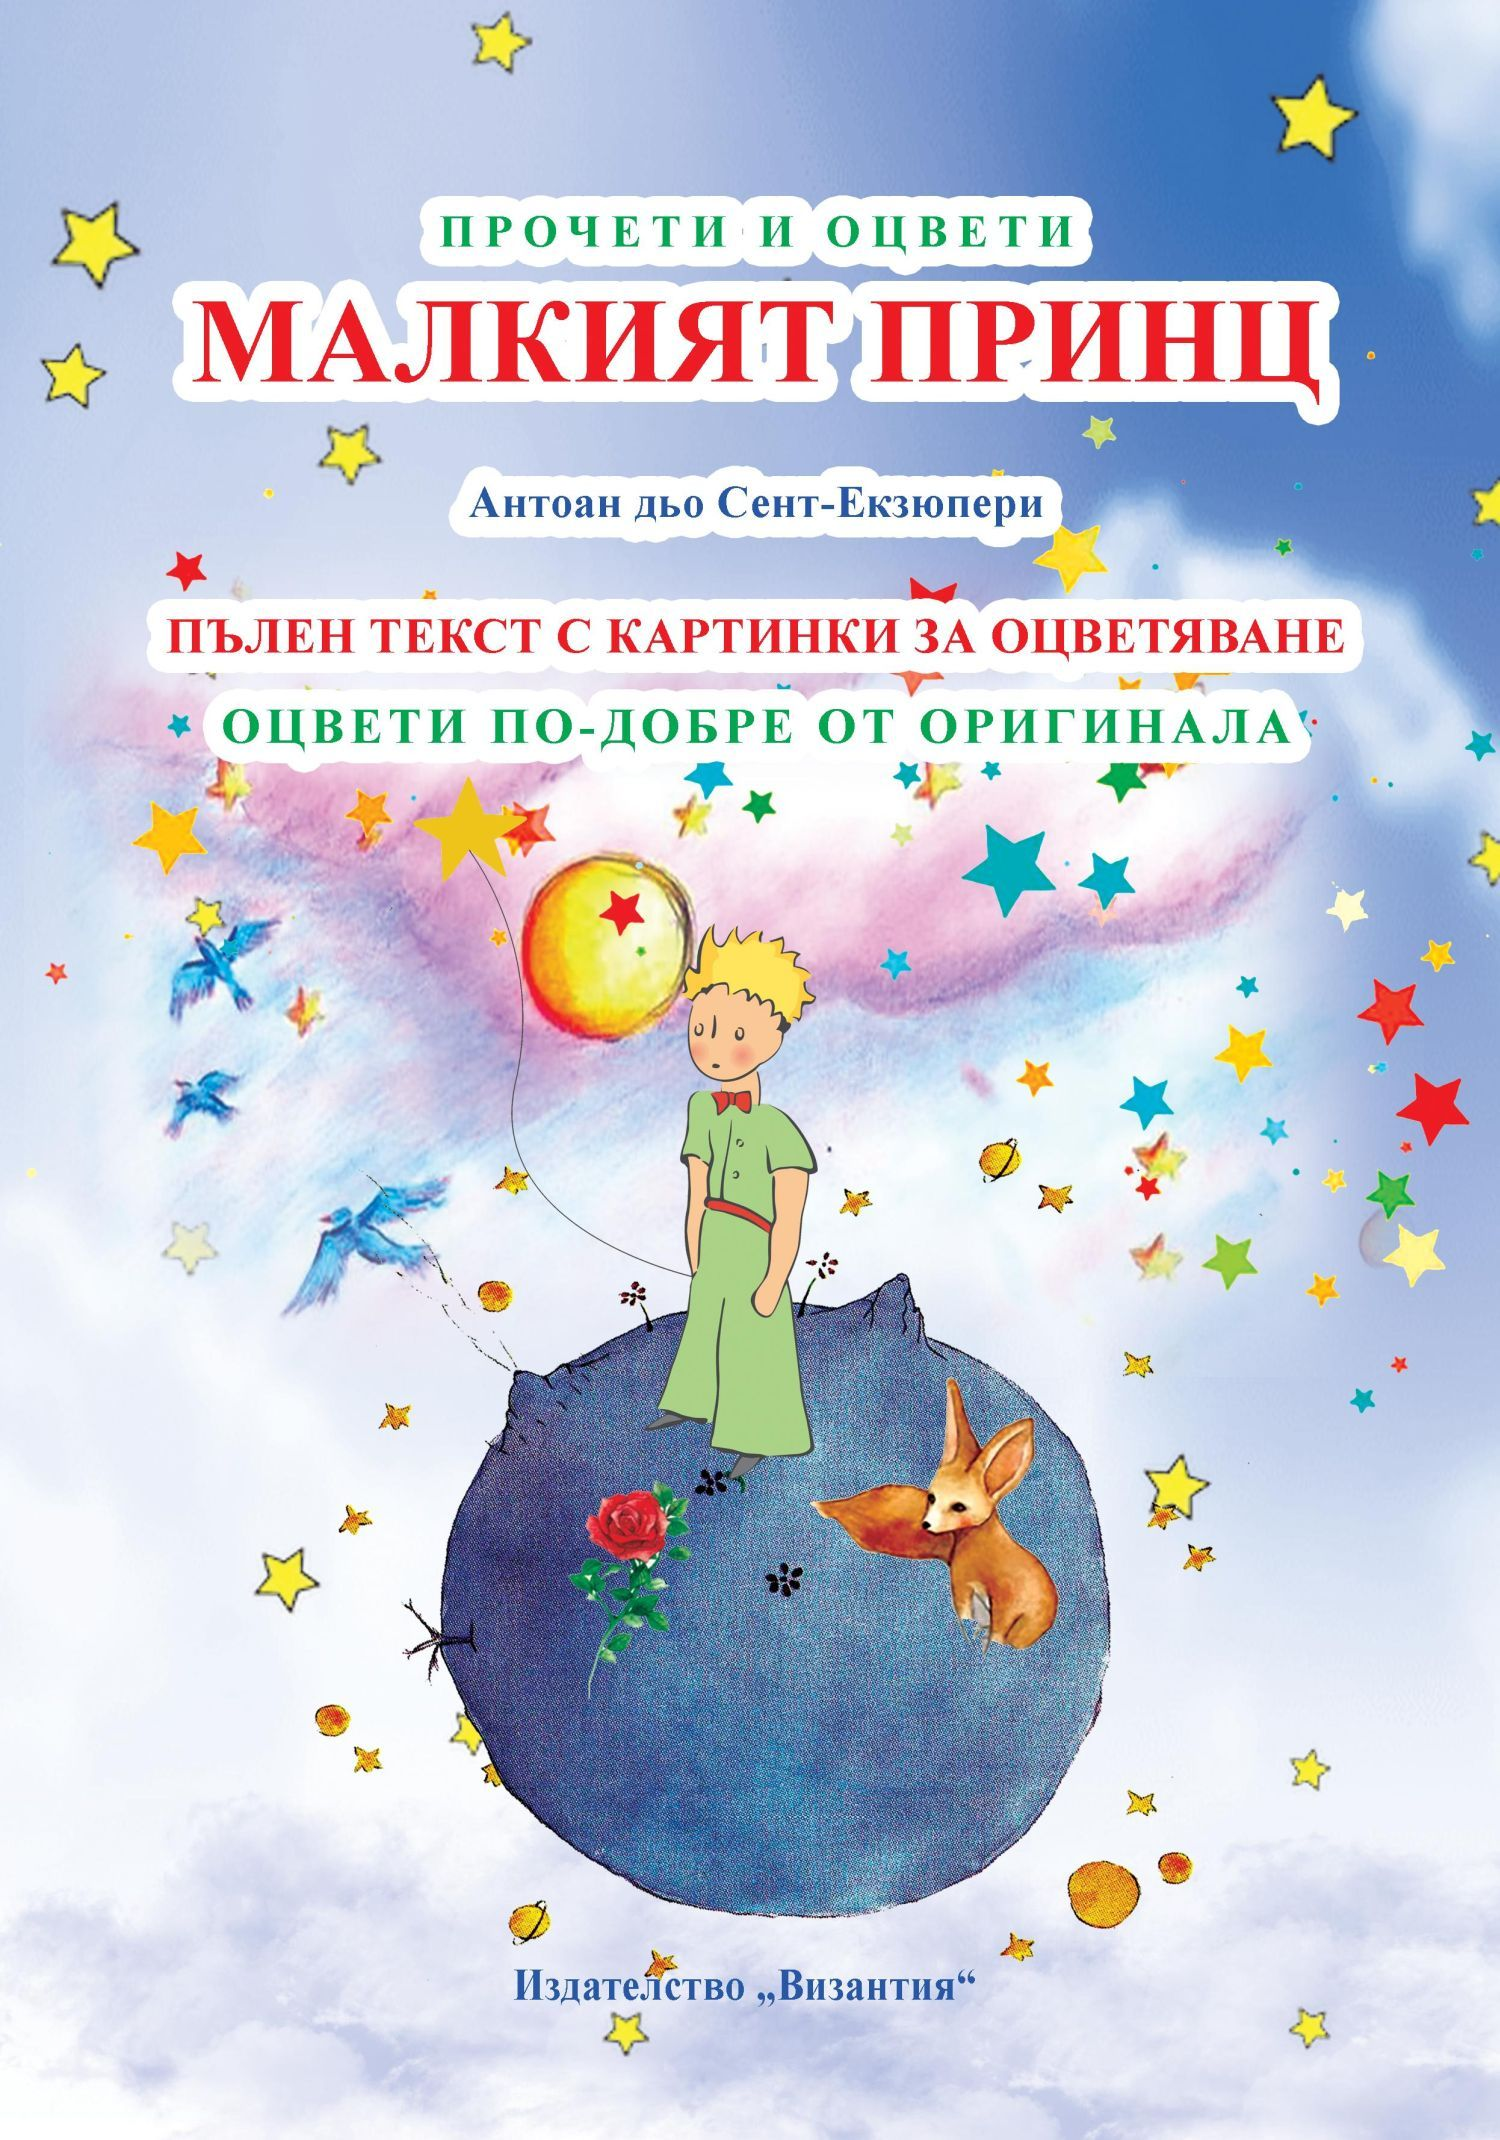 Прочети и оцвети: Малкият принц - 1